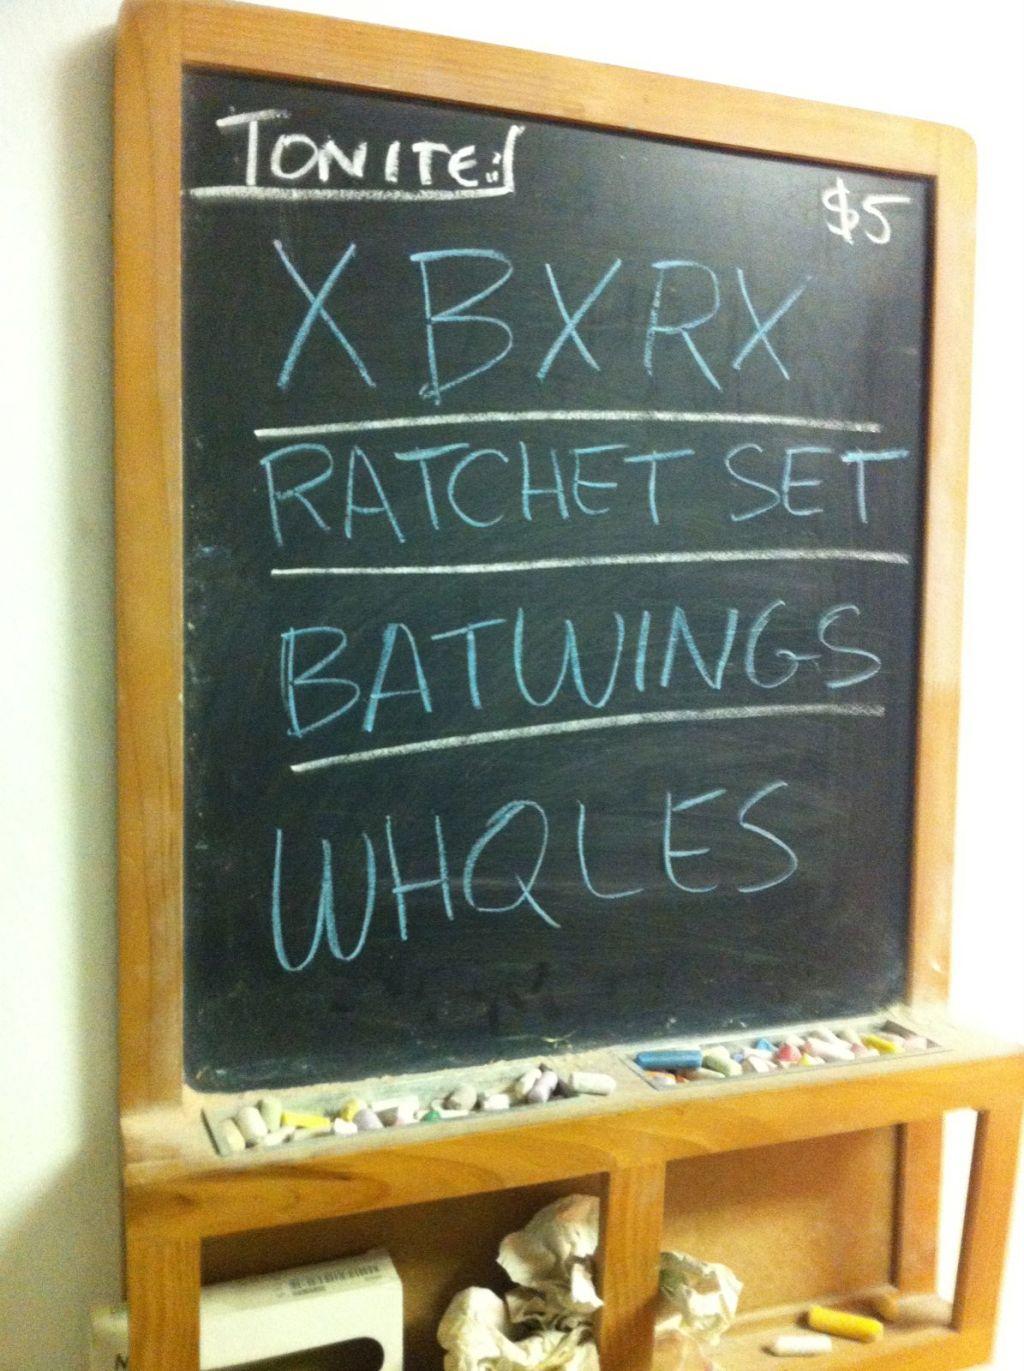 Photos: XBXRX, Ratchet Set, Whqles, Batwings